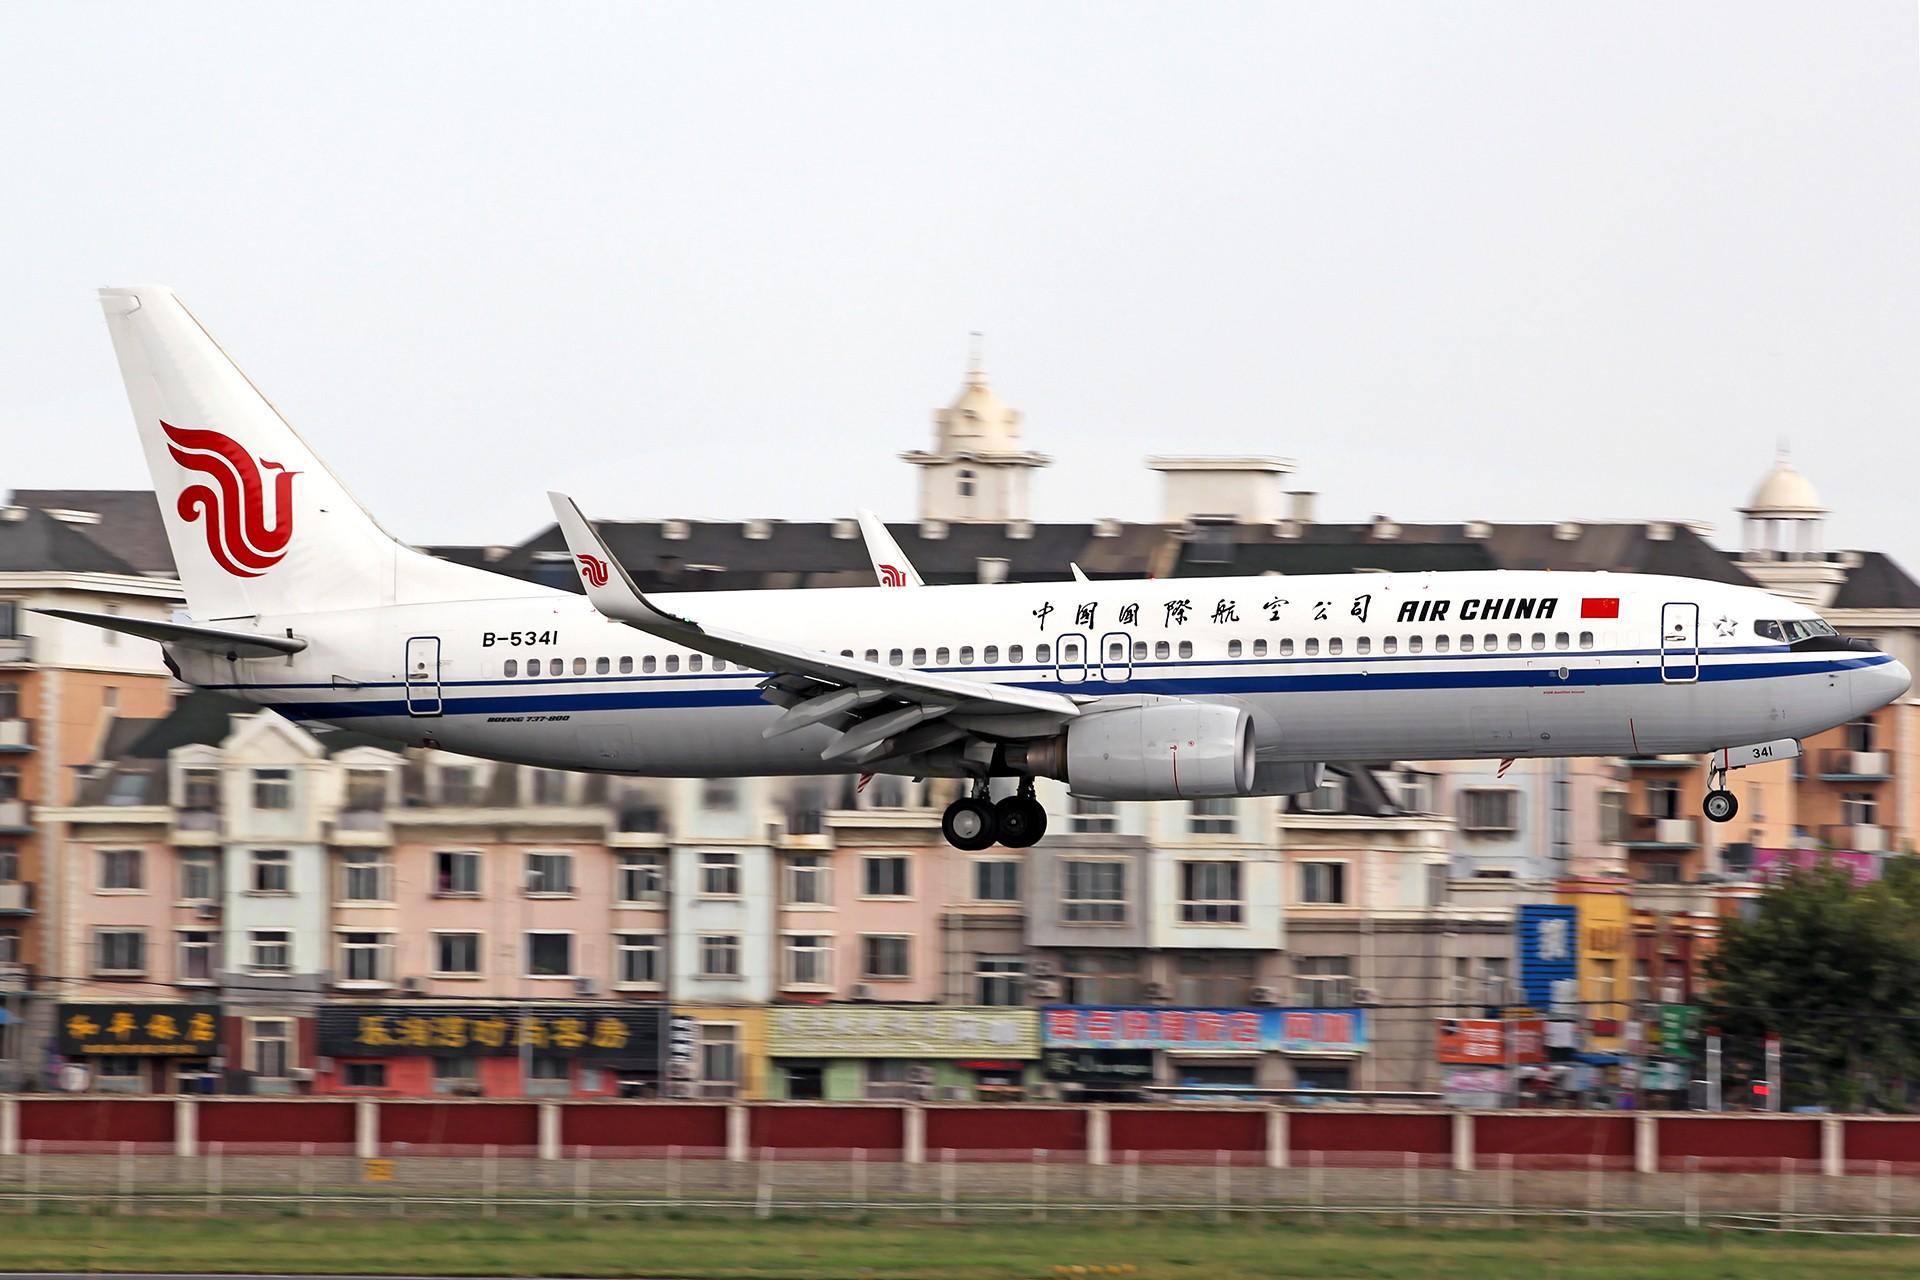 Re:[原创][DLC]。。。降落一组。。。 BOEING 737-800 B-5341 中国大连国际机场